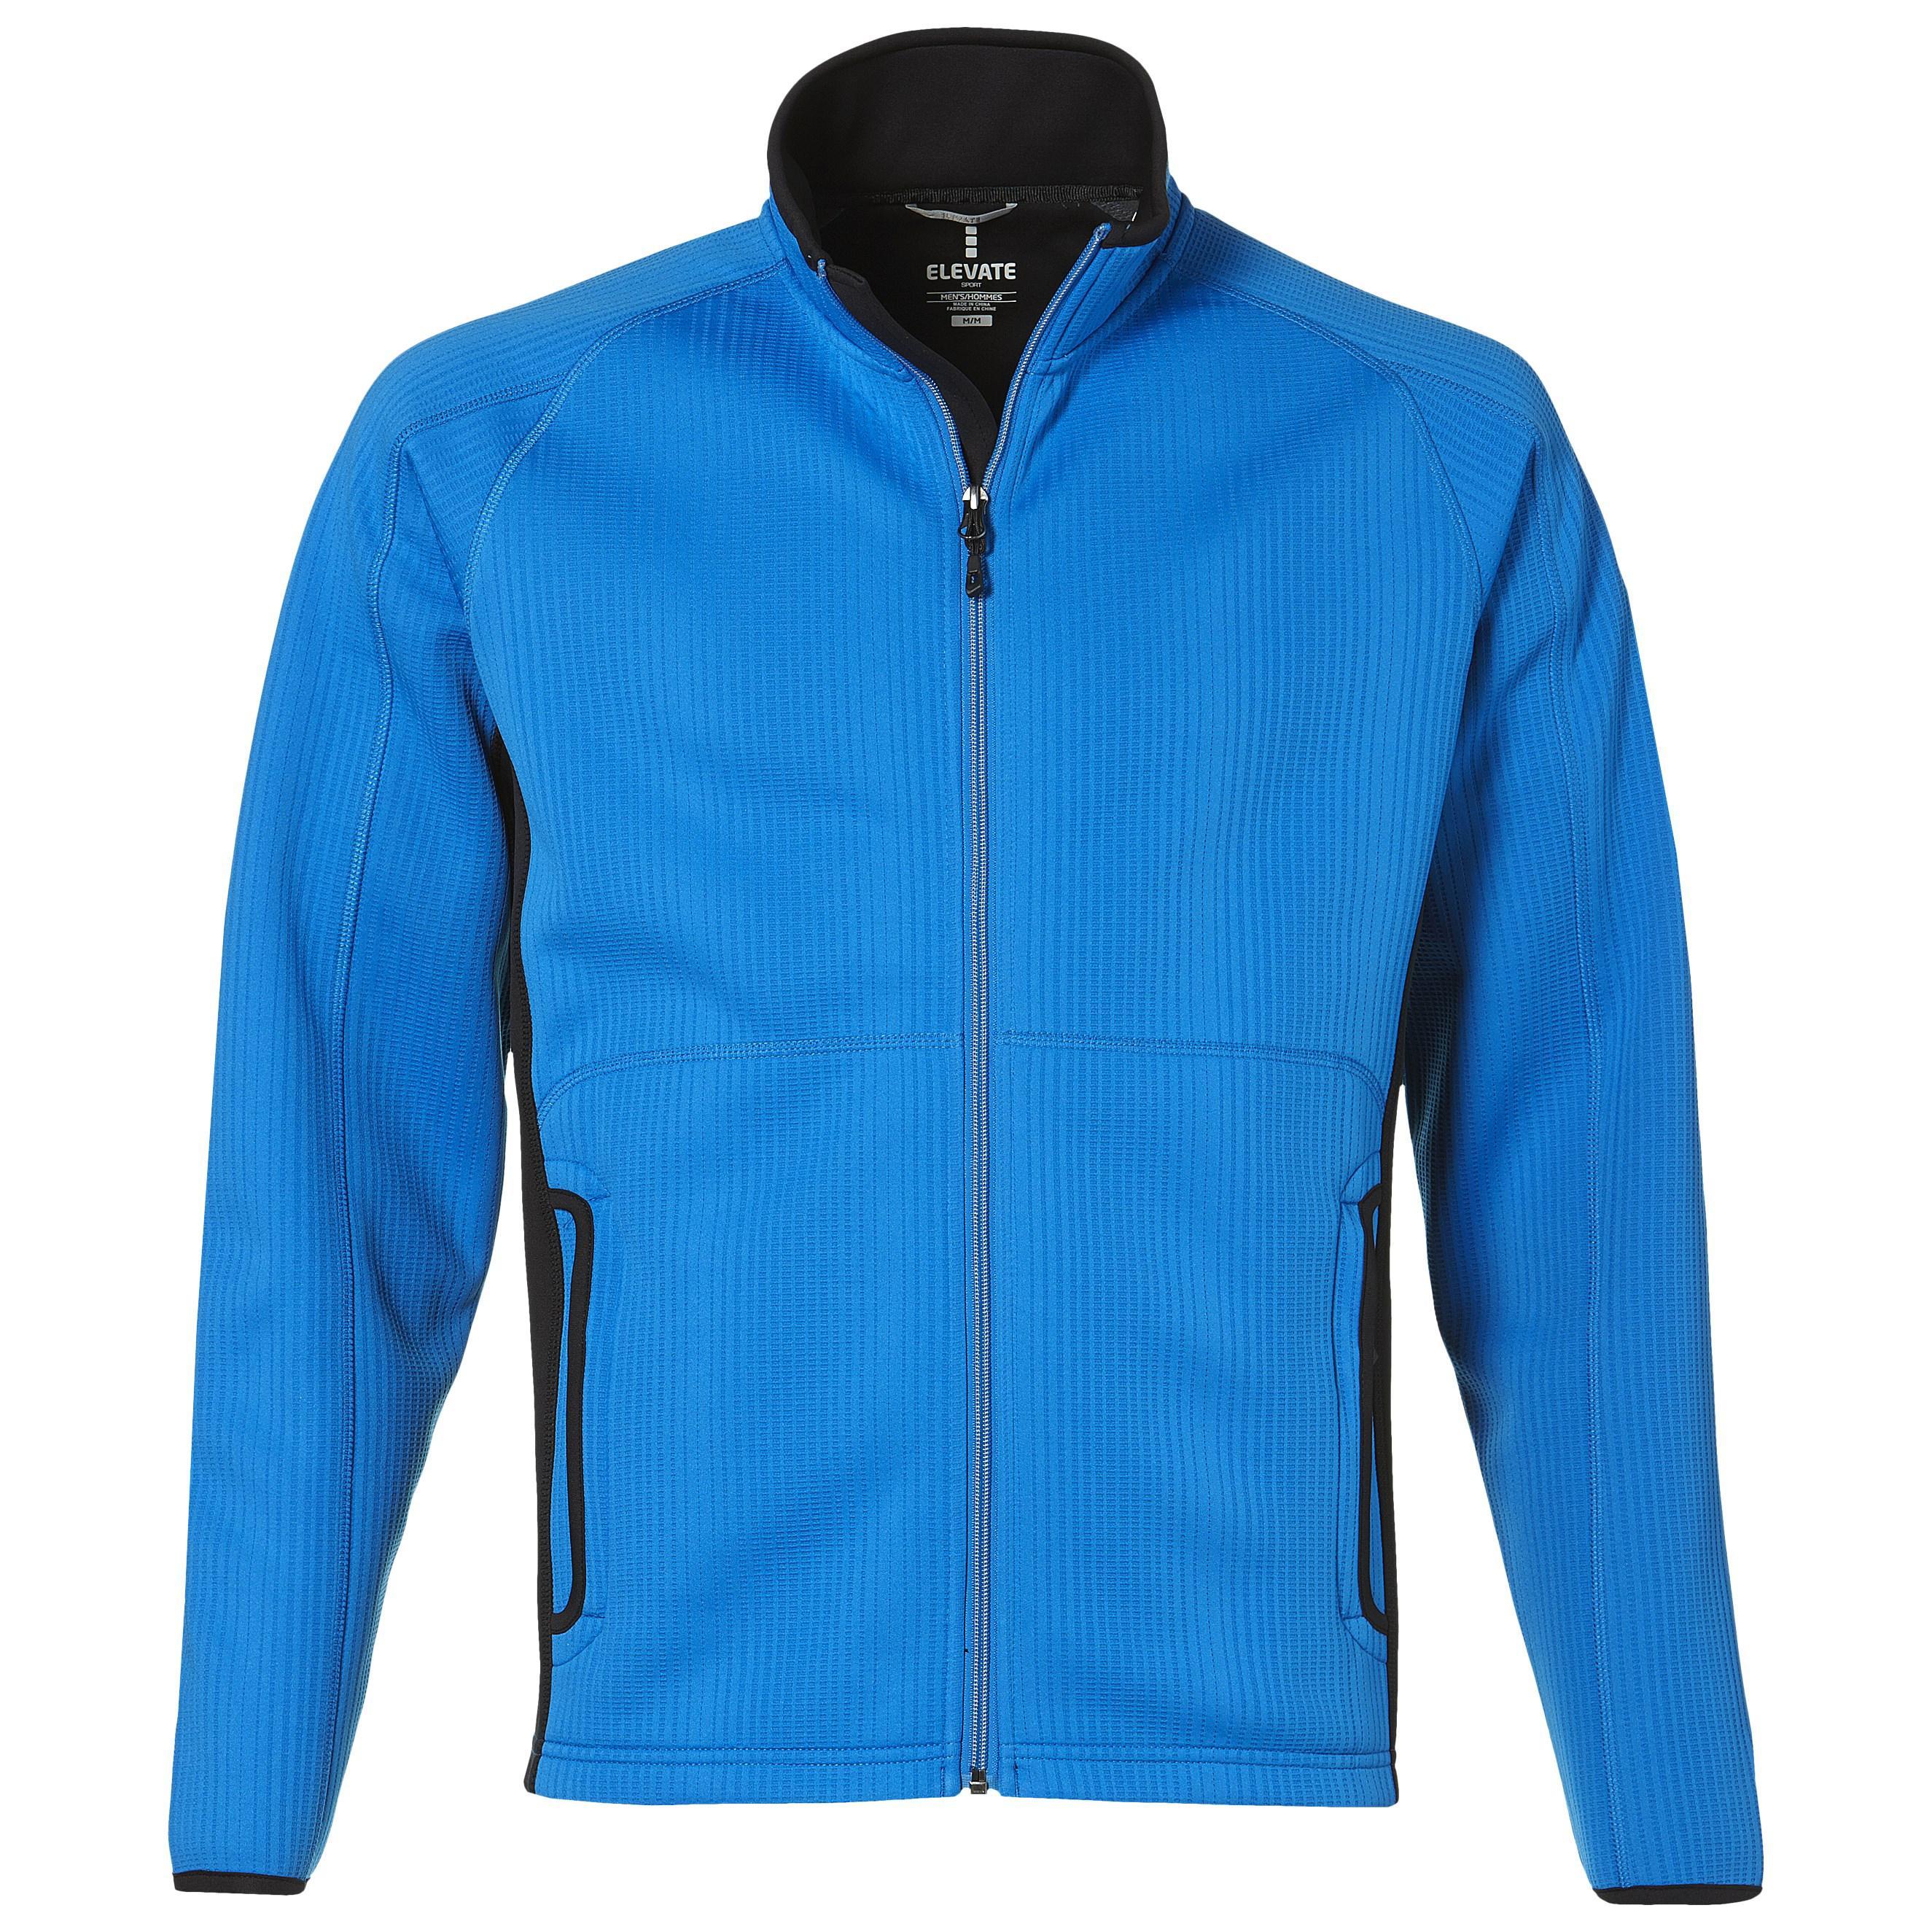 Mens Ferno Bonded Knit Jacket - Blue Only